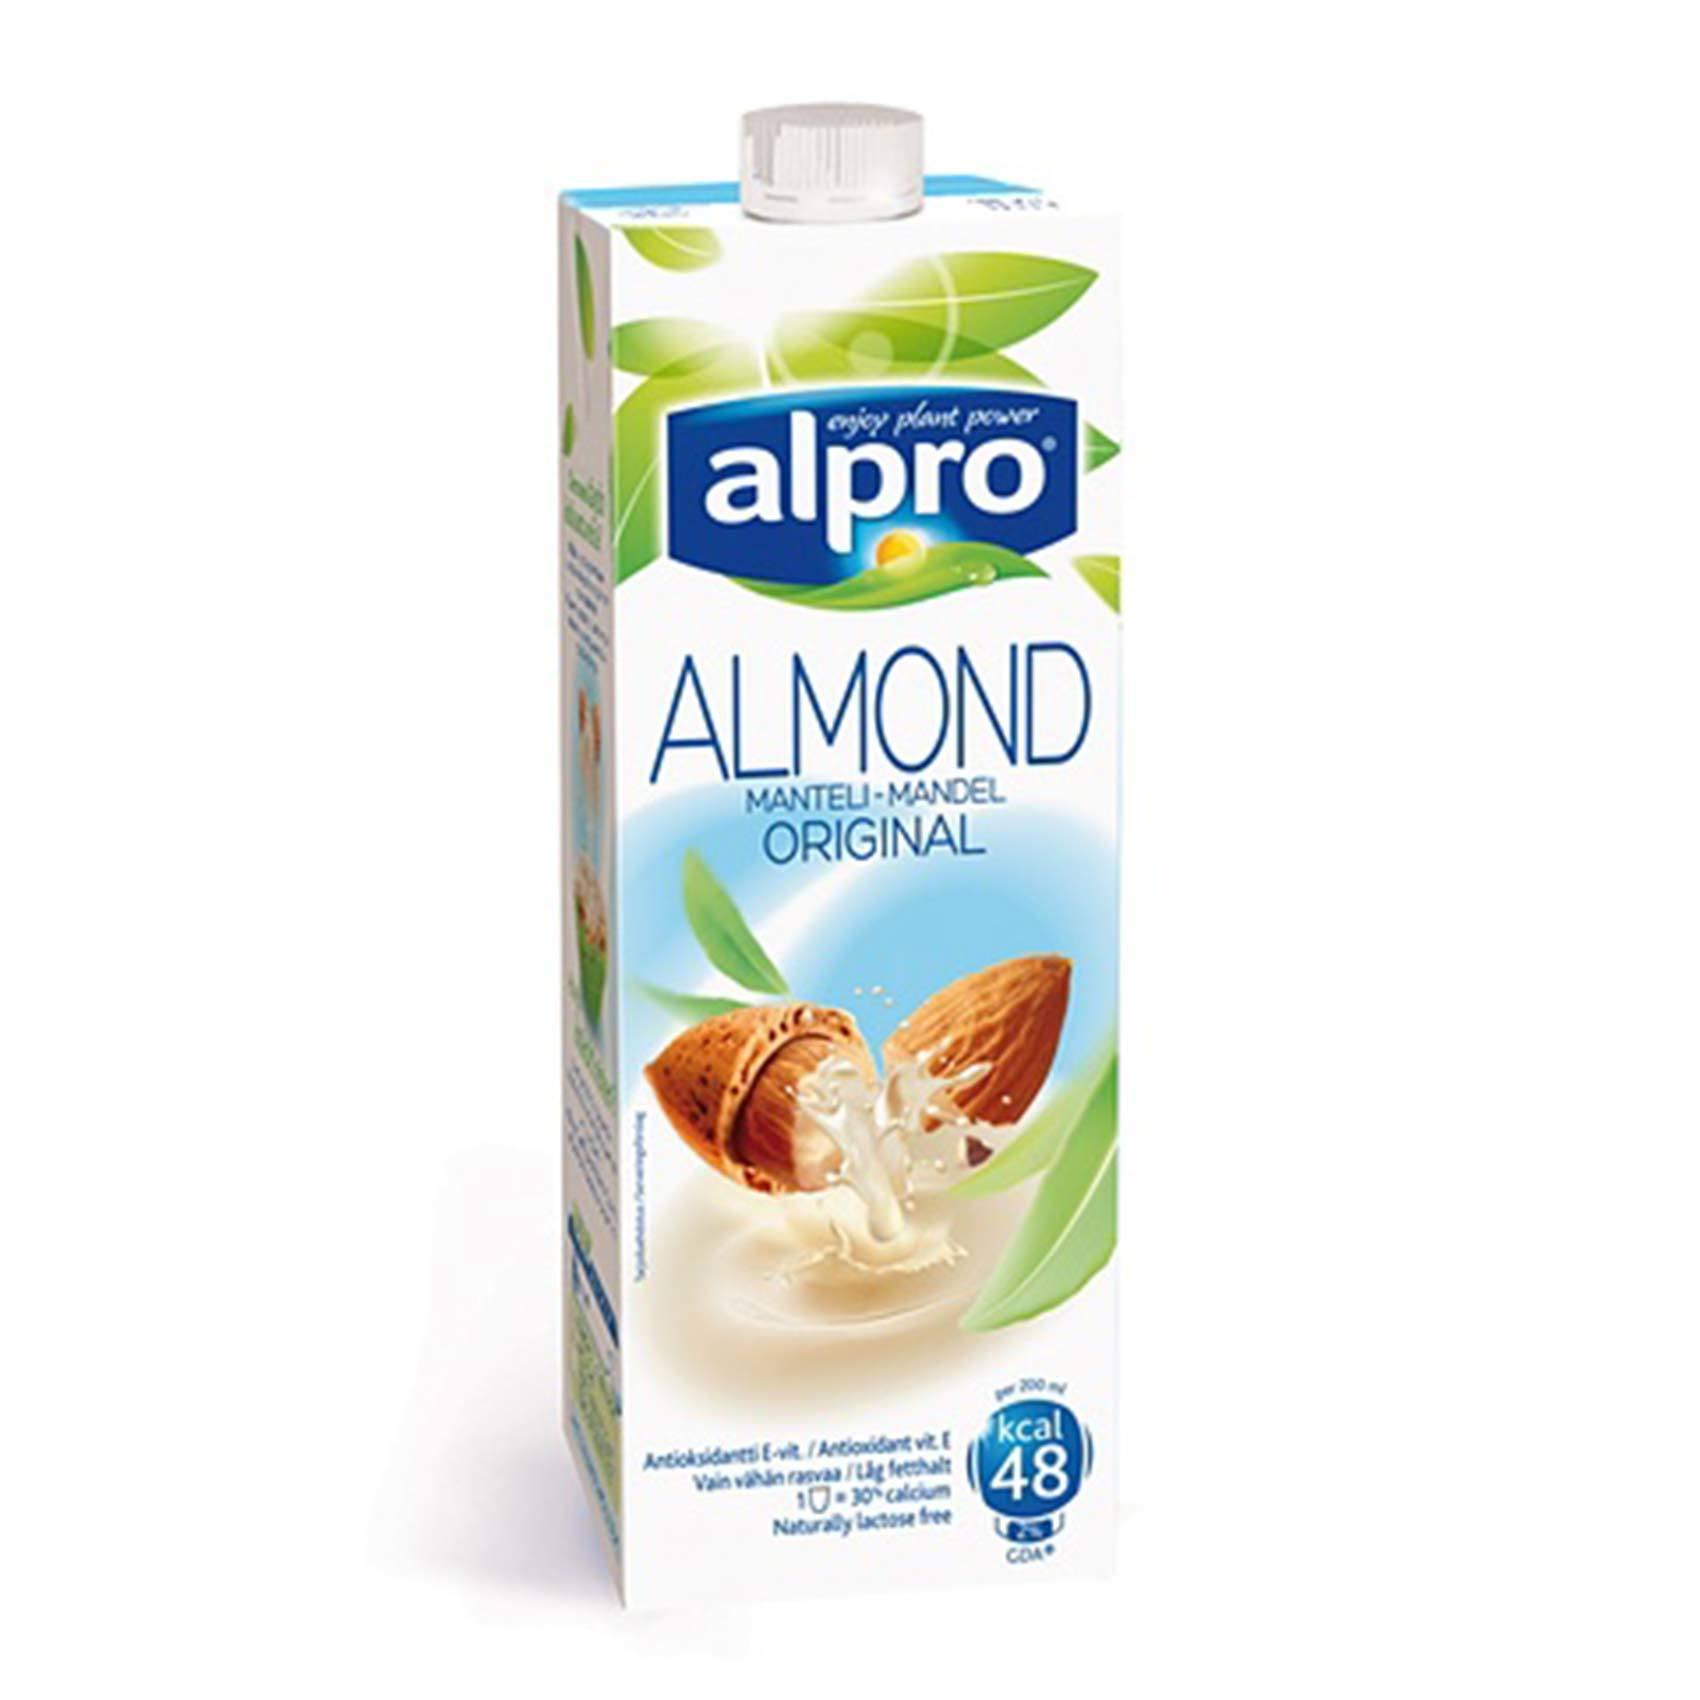 Buy Alpro Original Almond Milk 1 L Online Shop Fresh Food On Carrefour Saudi Arabia